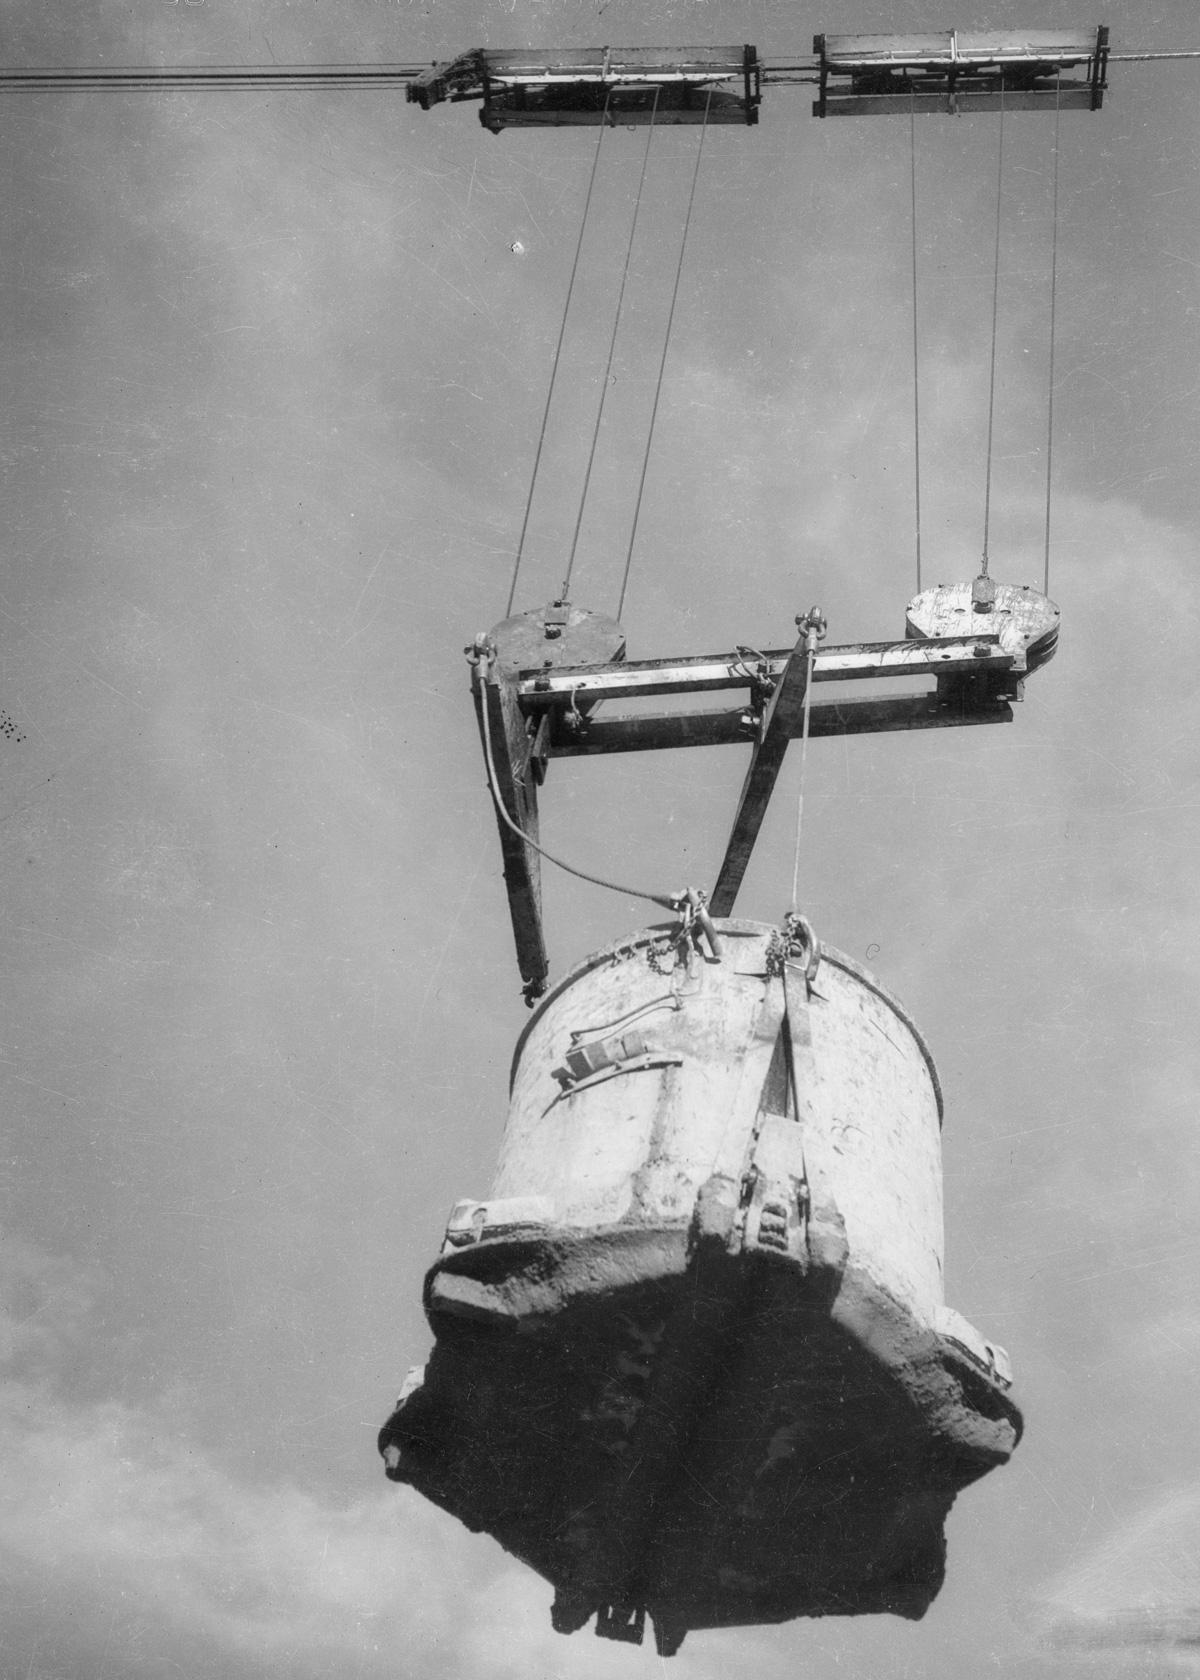 1934 --- Concrete conveyance dw-1934-412-08-67~37 --- Image by © Dick Whittington Studio/Corbis